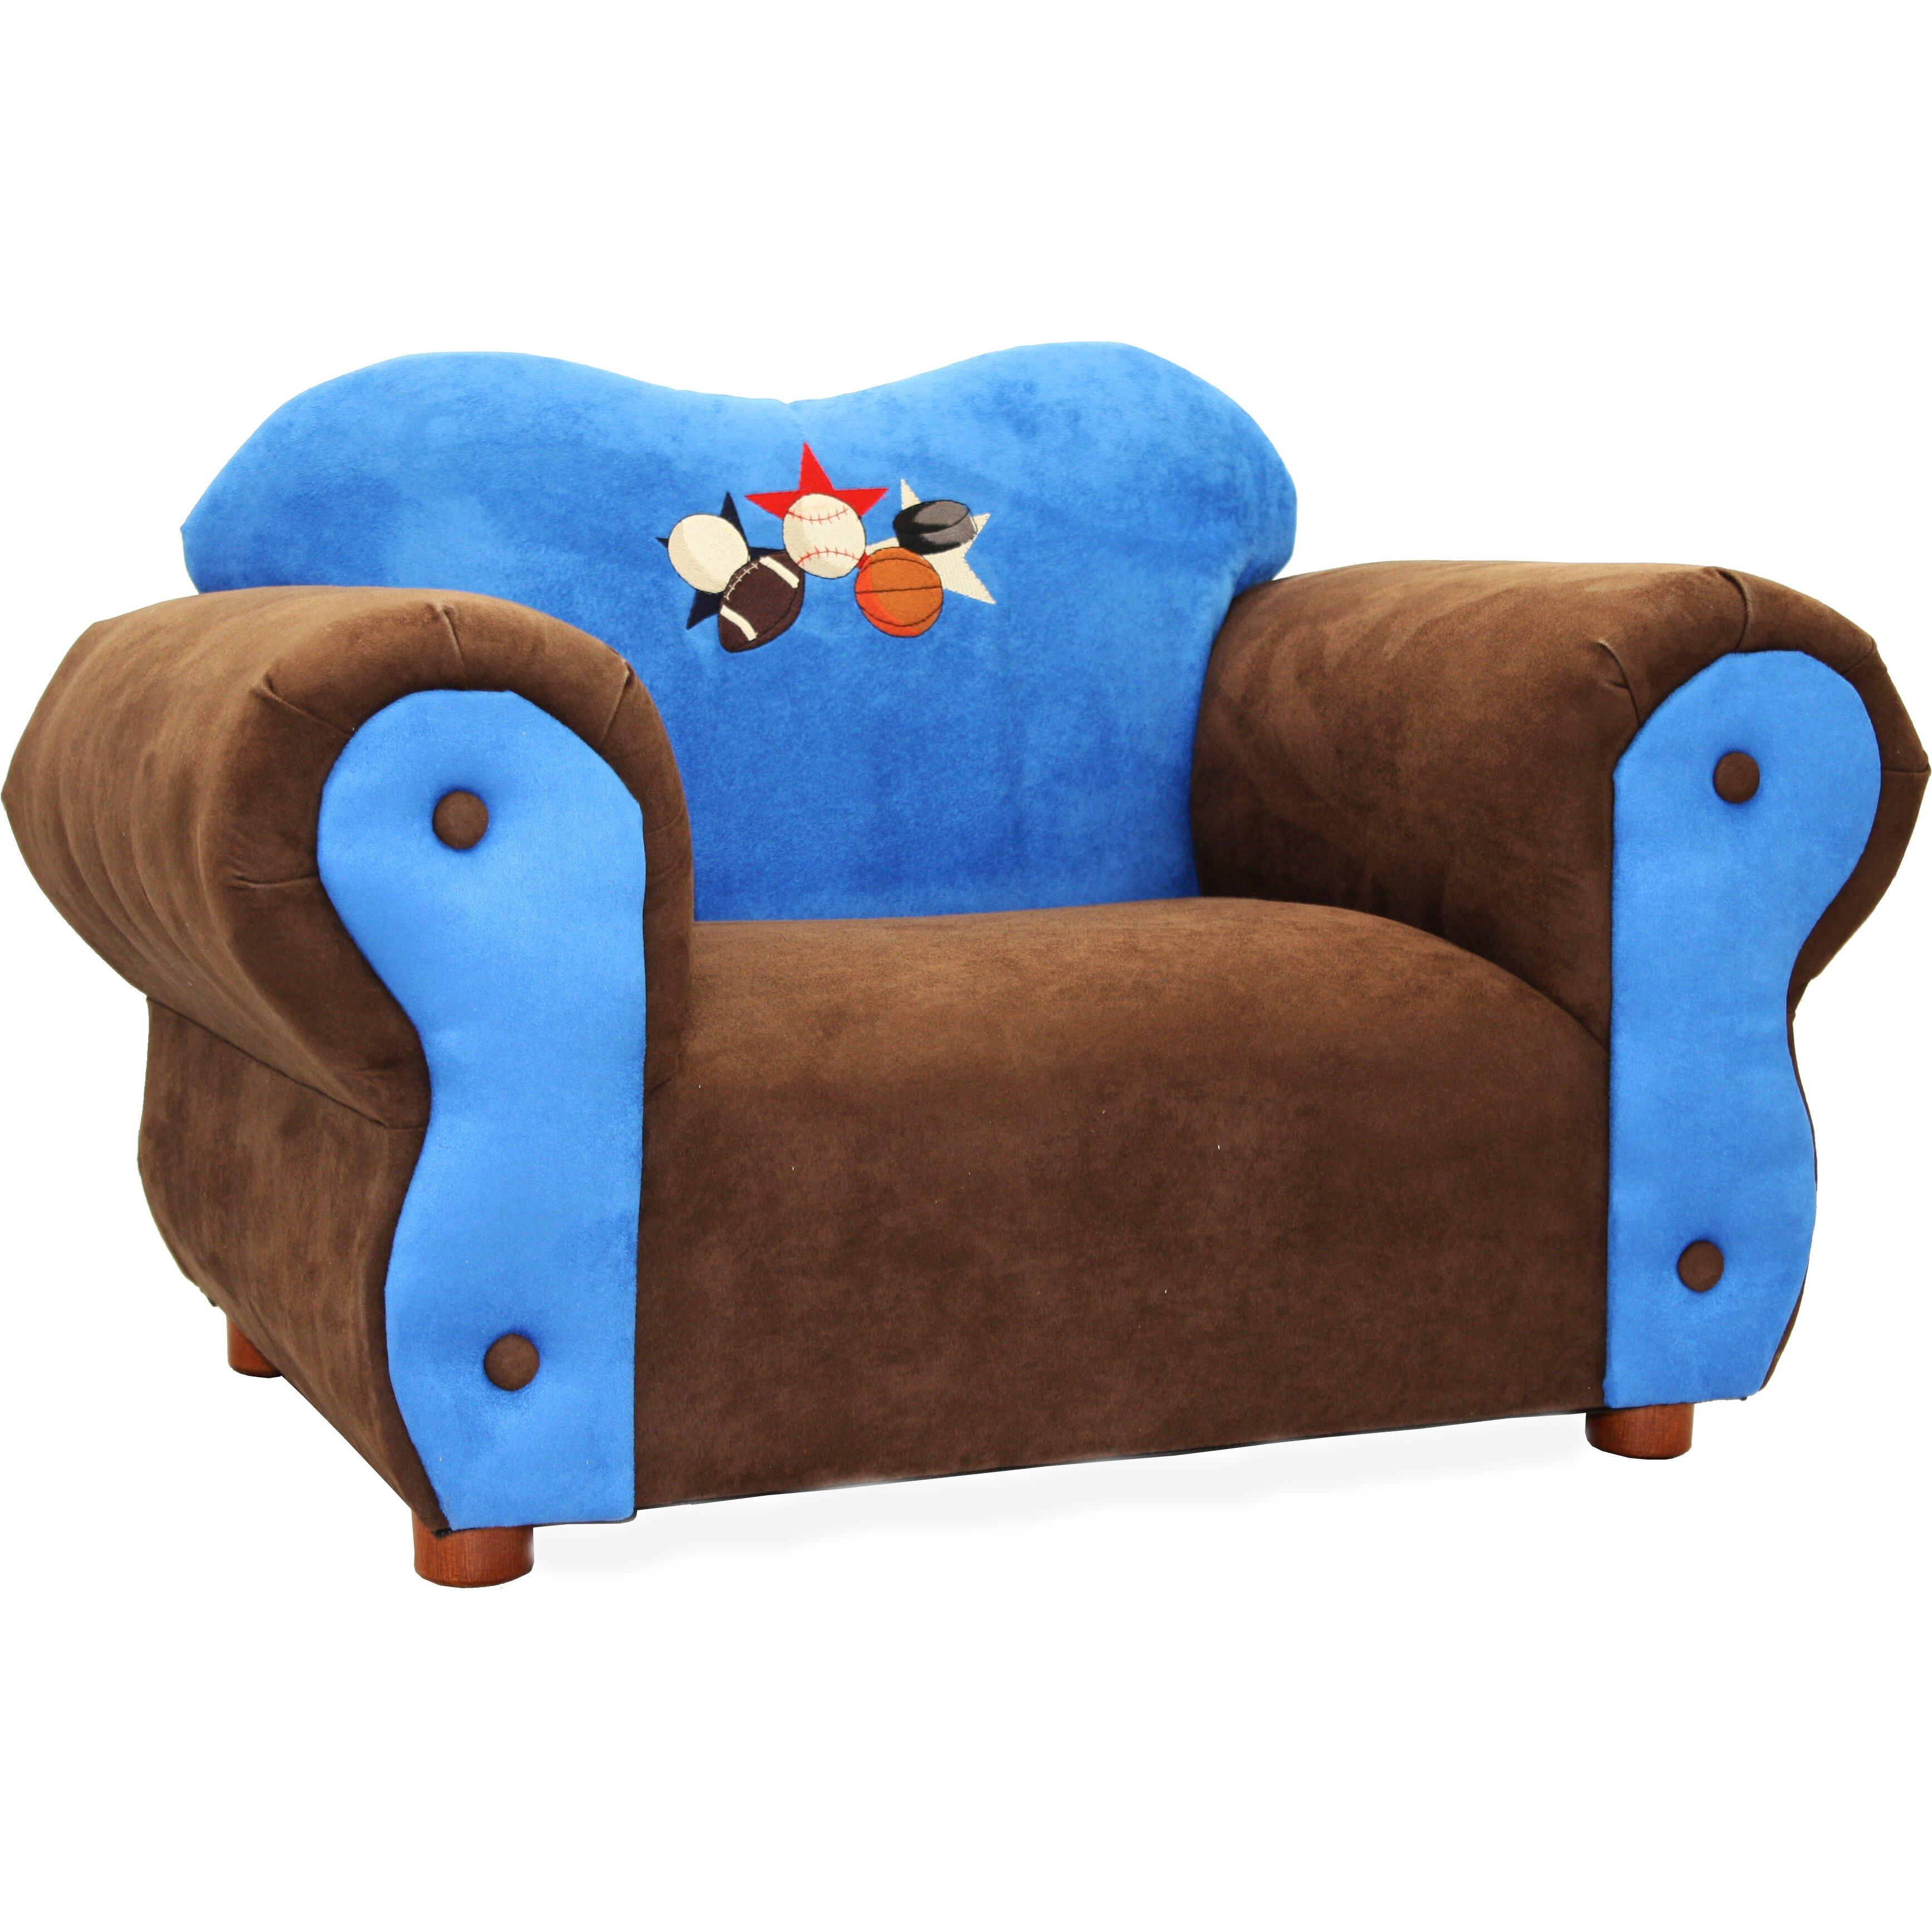 Keet comfy kids club chair reviews wayfair for Kids comfy chair